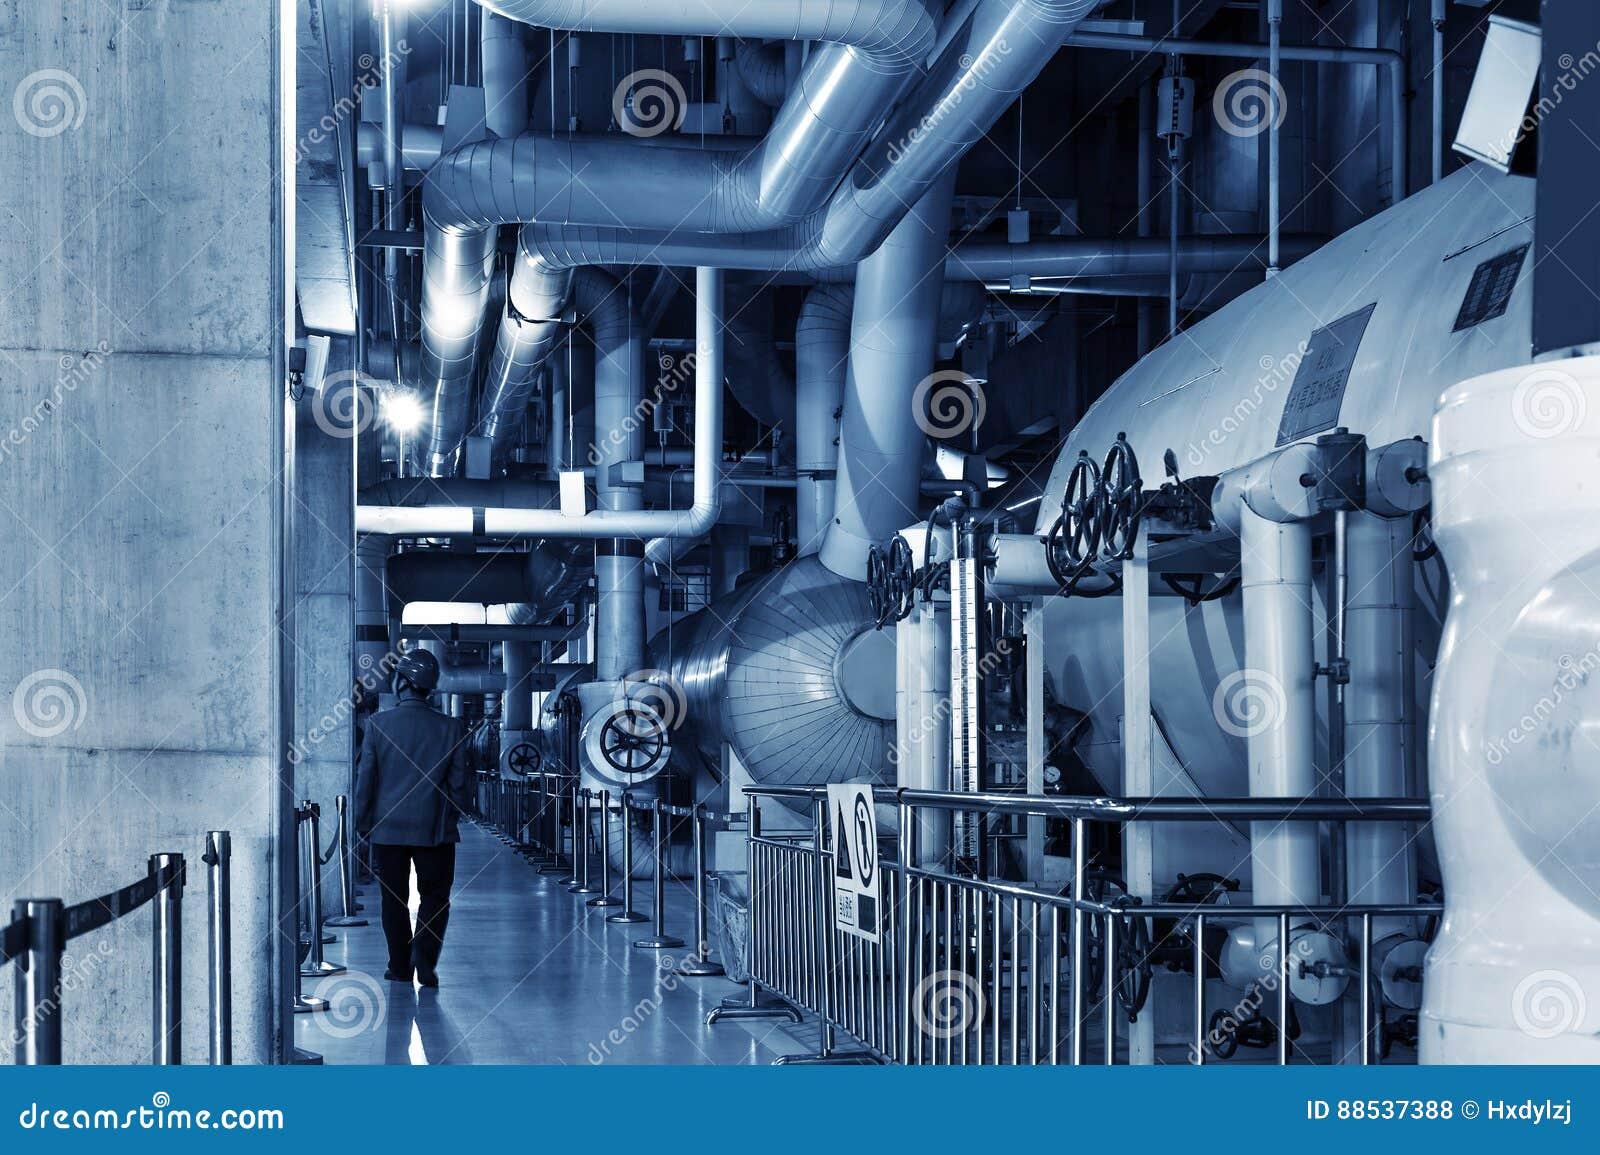 Modern Boiler Room Equipment For Heating System. Stock Photo - Image ...